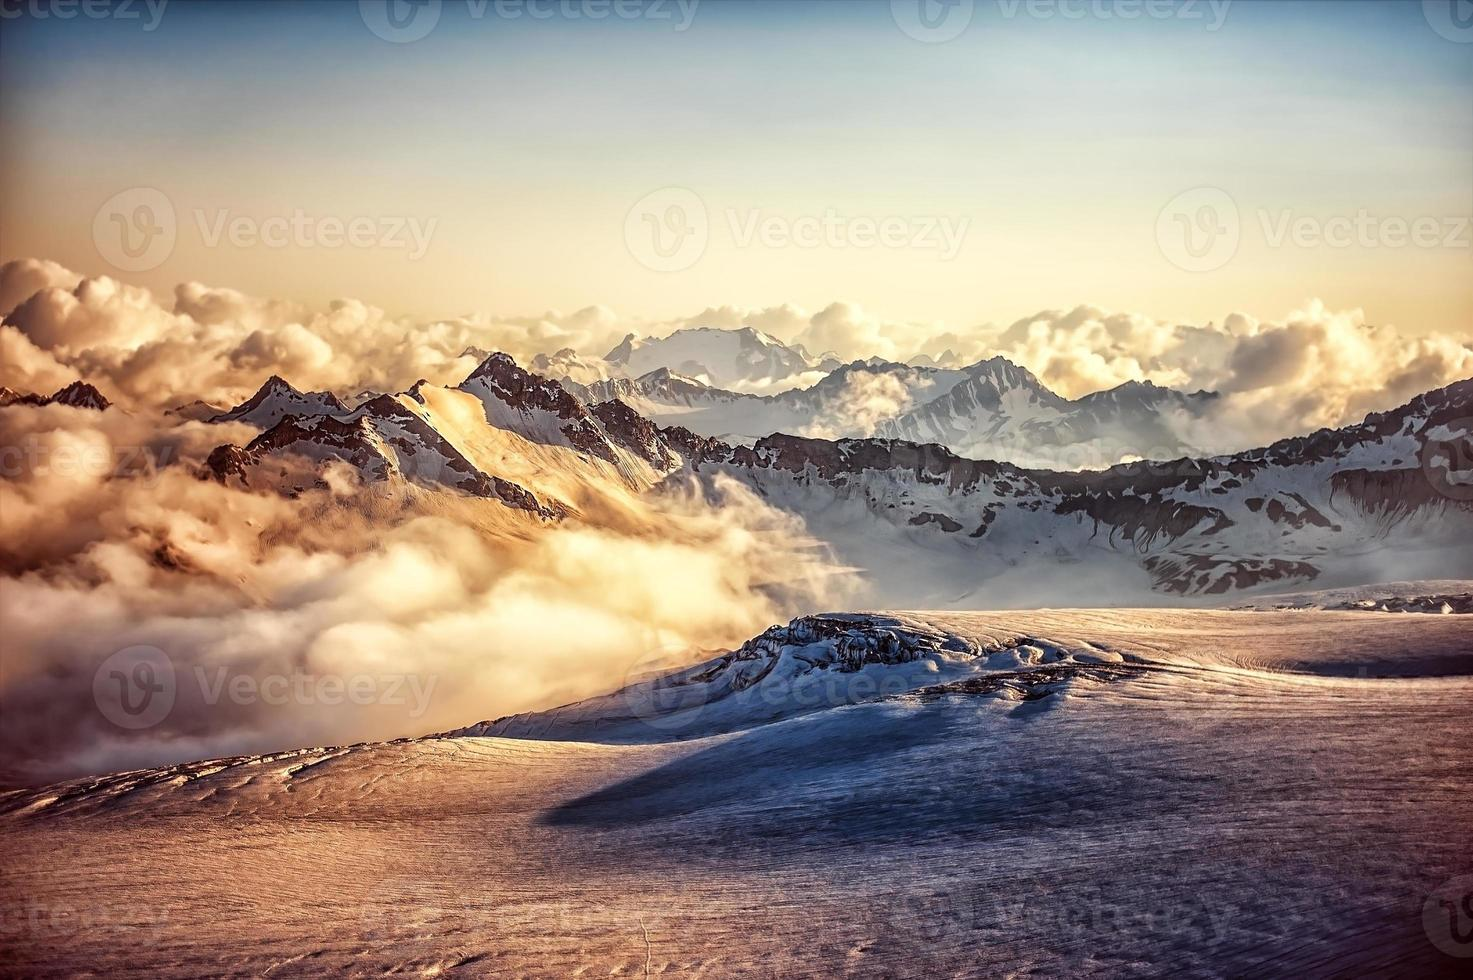 mountain ridge of Western Caucasus at sunset or sunrise photo